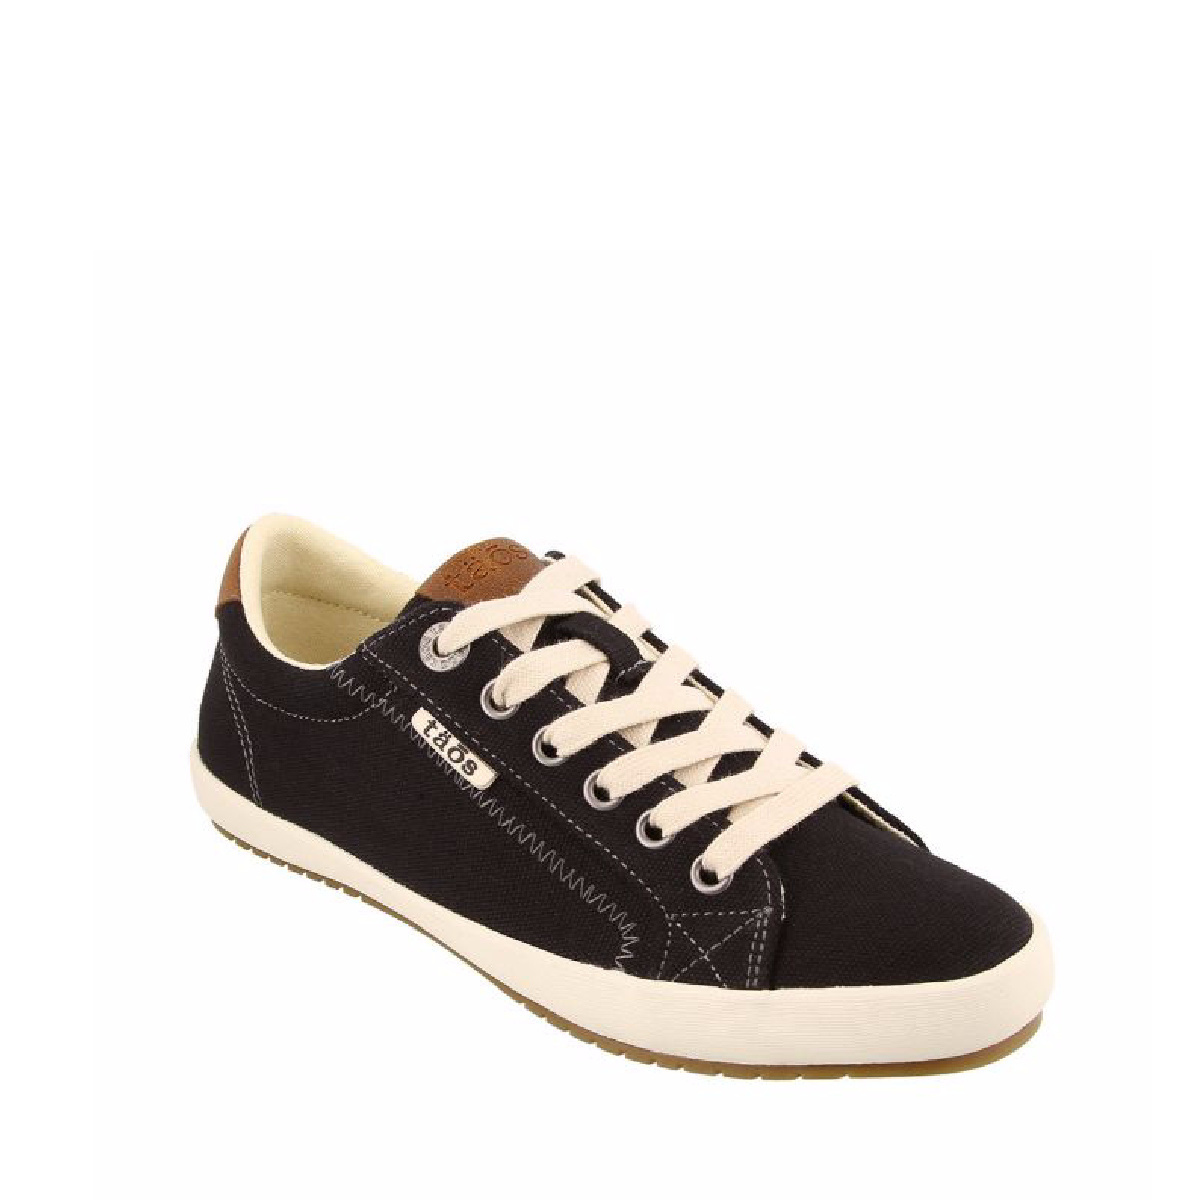 Taos Footwear Taos Star Burst Sneaker Black